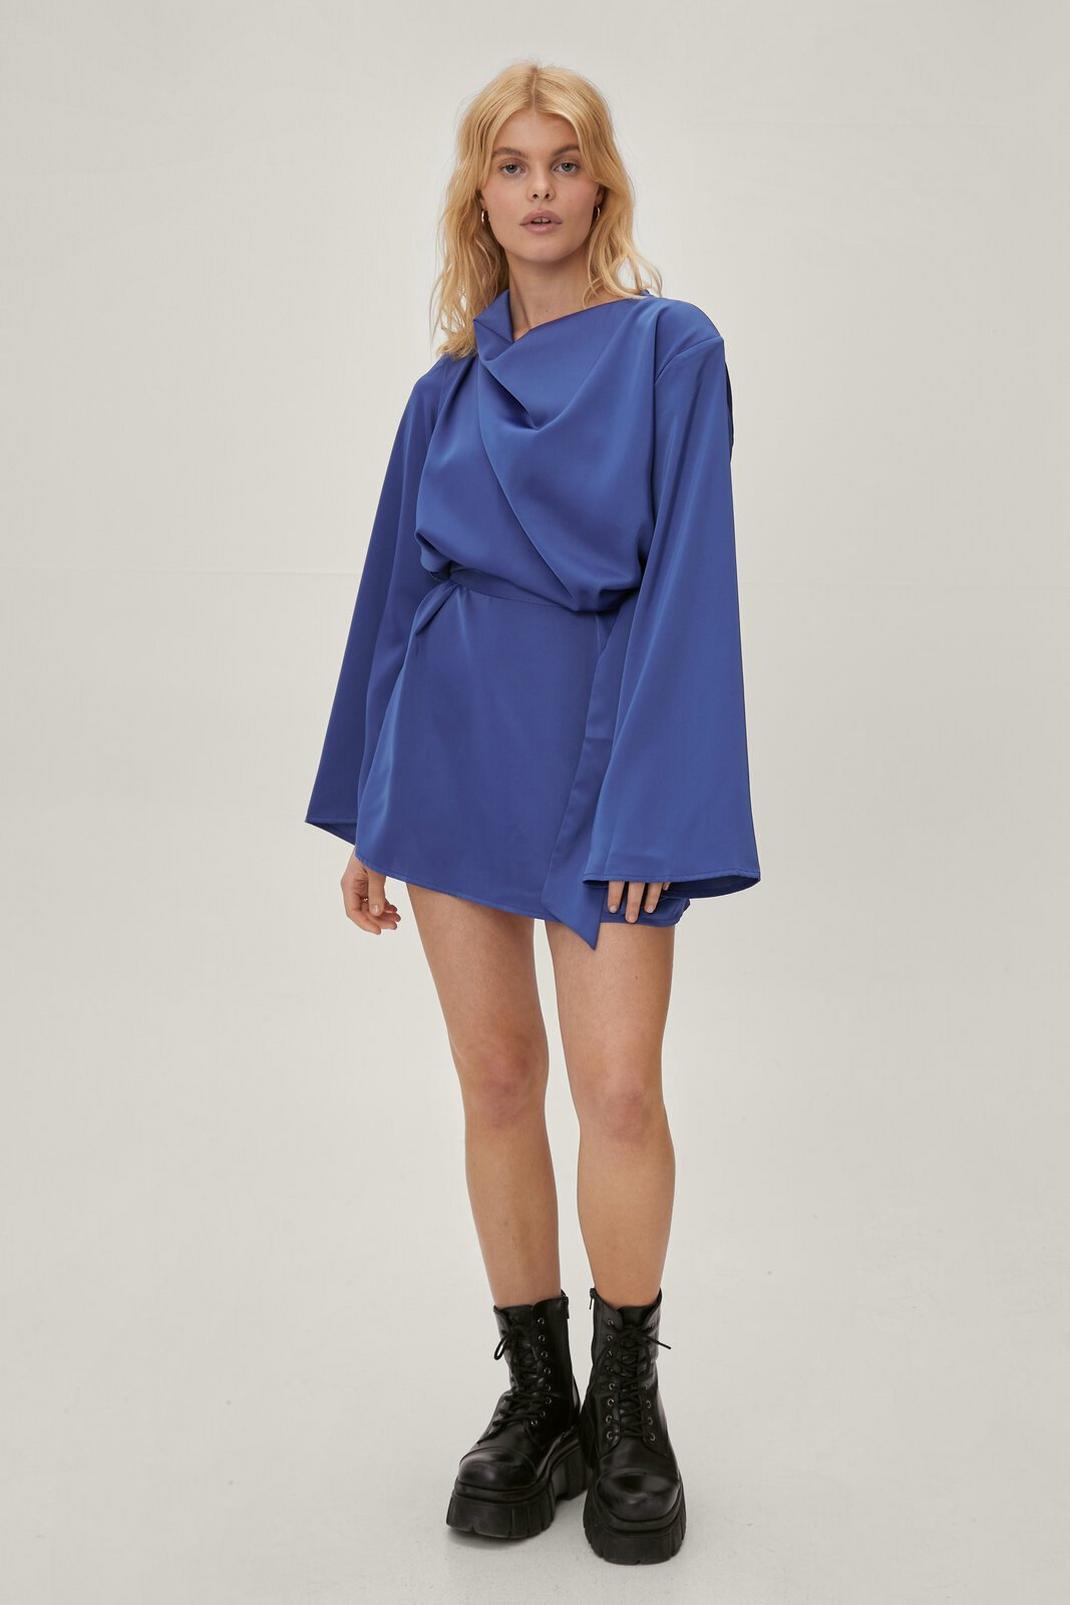 Petite Cowl Neck Flared Sleeve Mini Dress | Nasty Gal